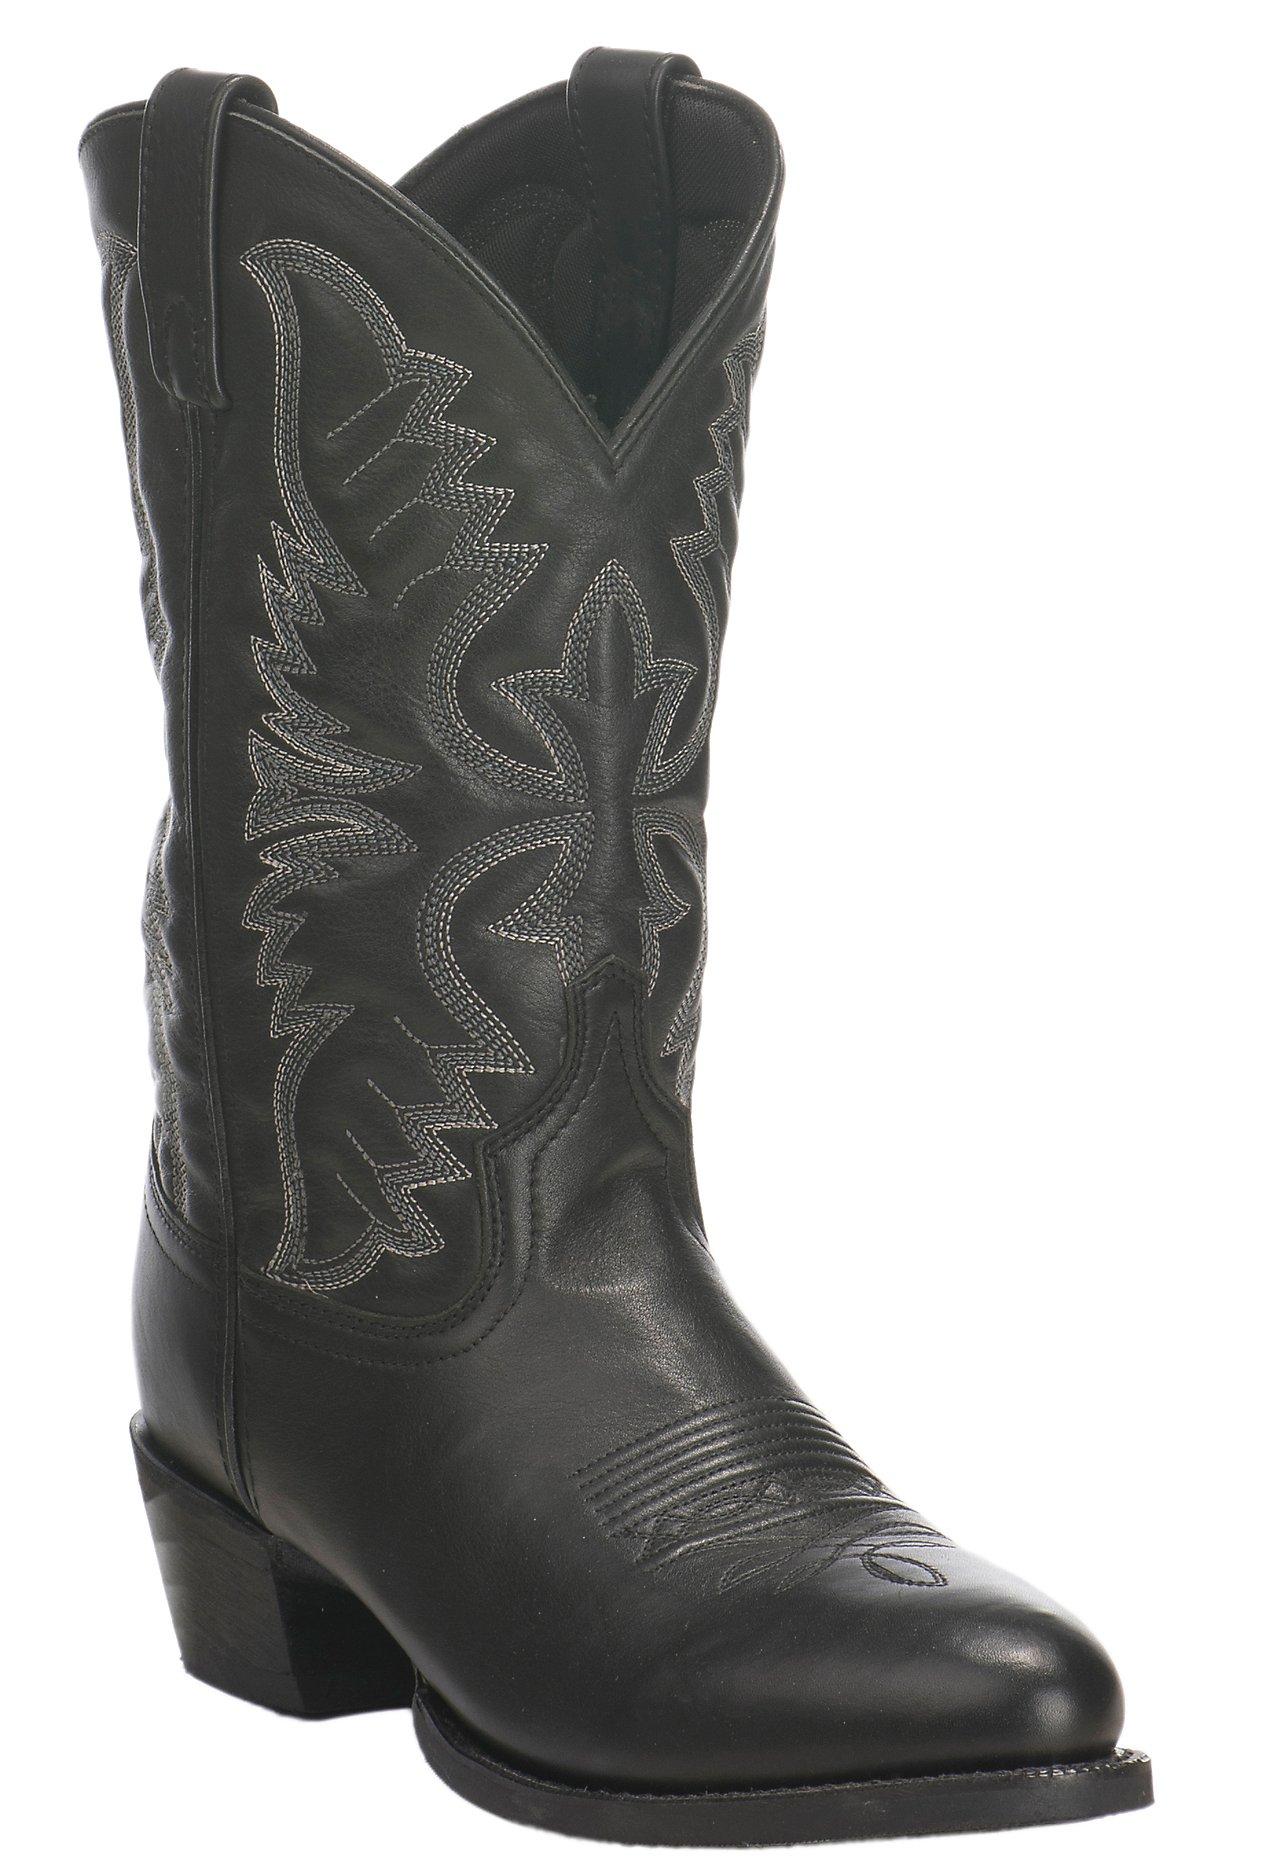 Men's Cowboy Boots & Western Boots for Men | Cavender's